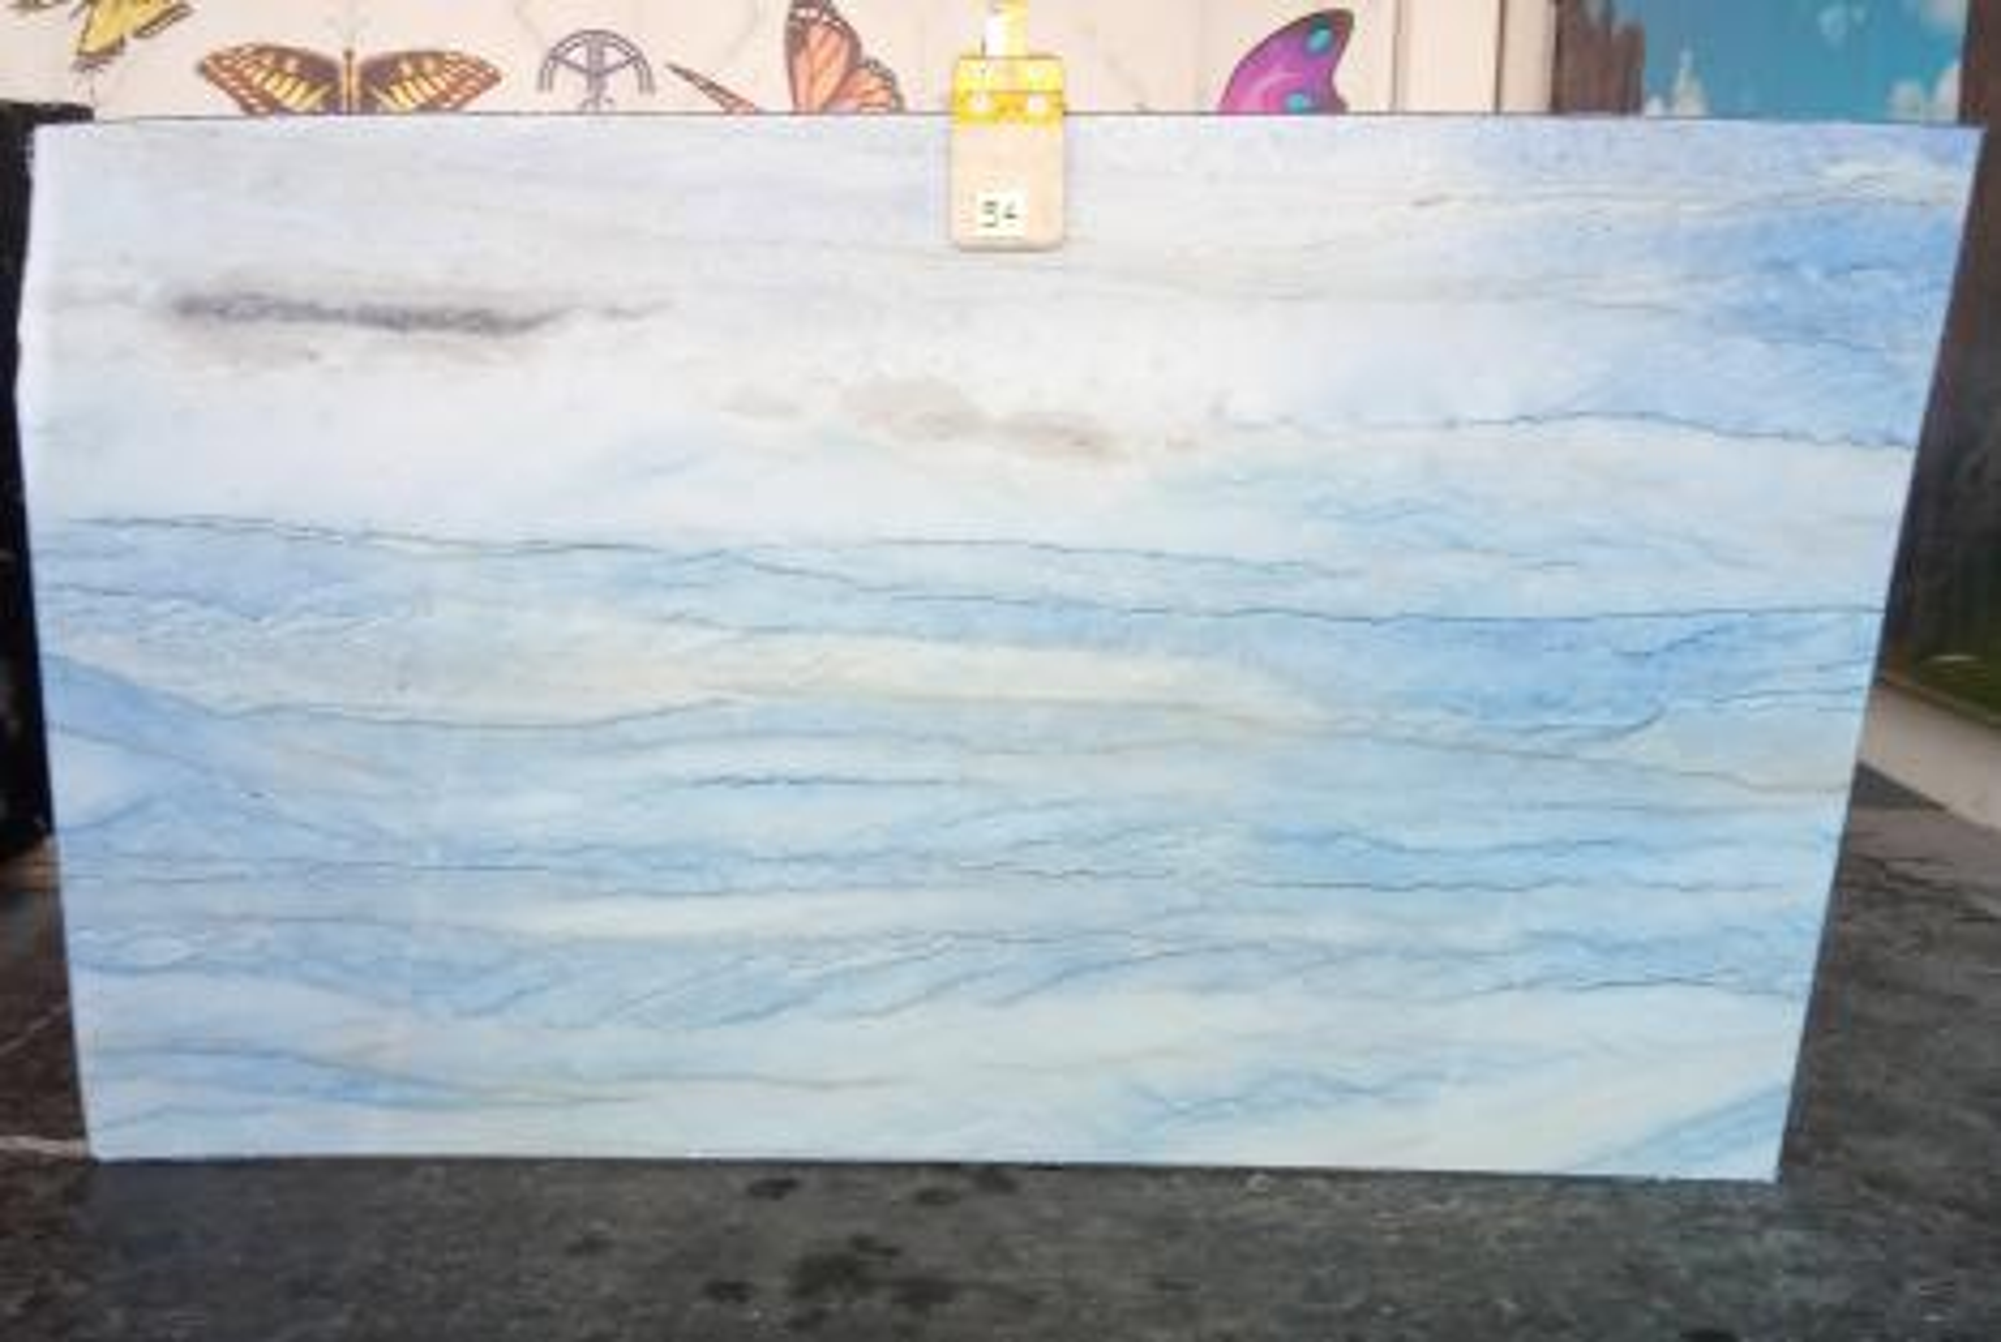 AZUL MAKAUBA Suministro Veneto (Italia) de planchas pulidas en mármol natural Z0191 , Slab #54